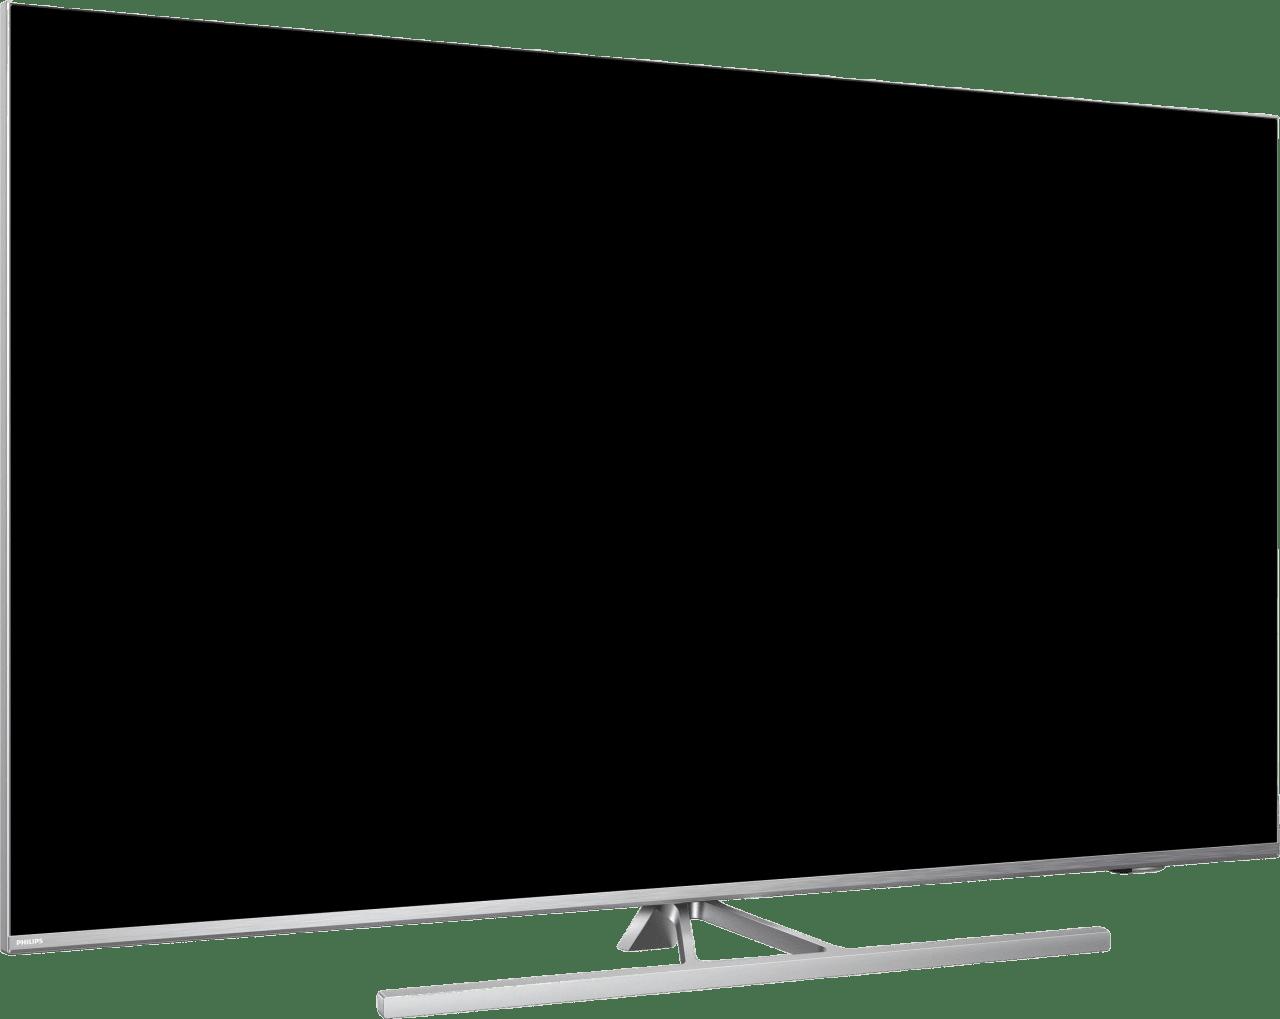 Helles Silber Philips TV 43 Zoll 43PUS8506/12 LED 4K UHD.2